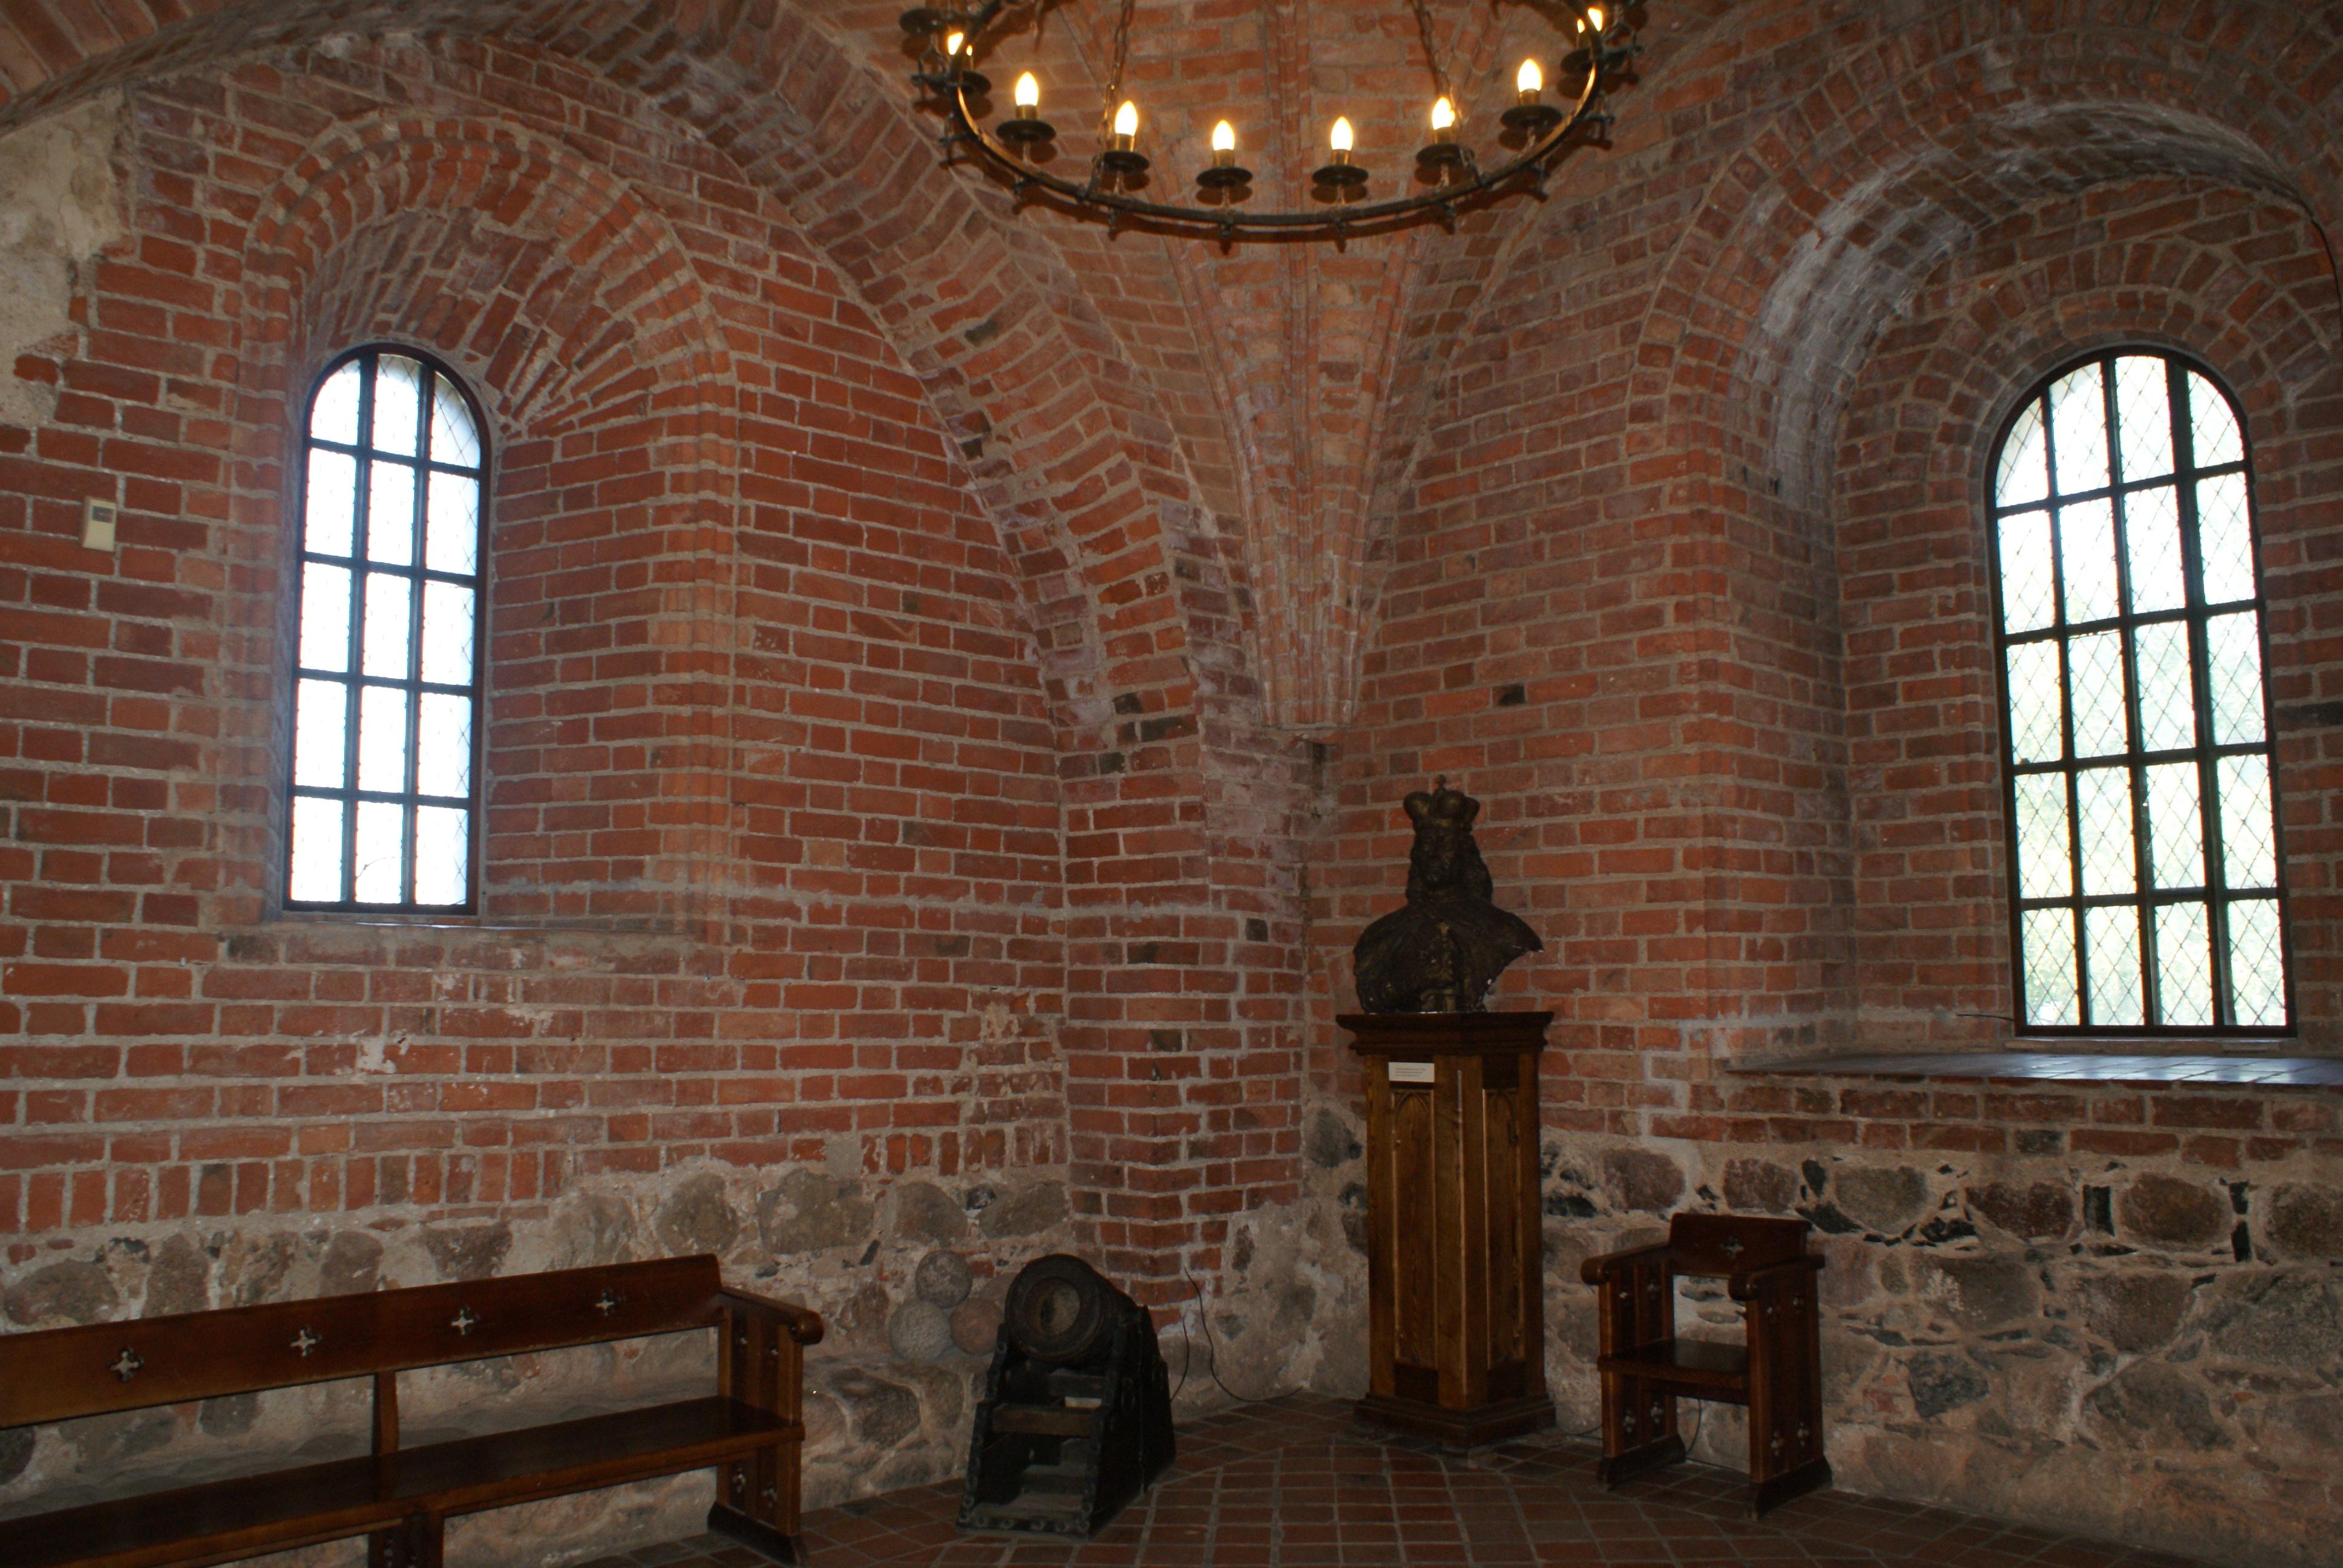 fileinterior and collection of the trakai island castle 01jpg